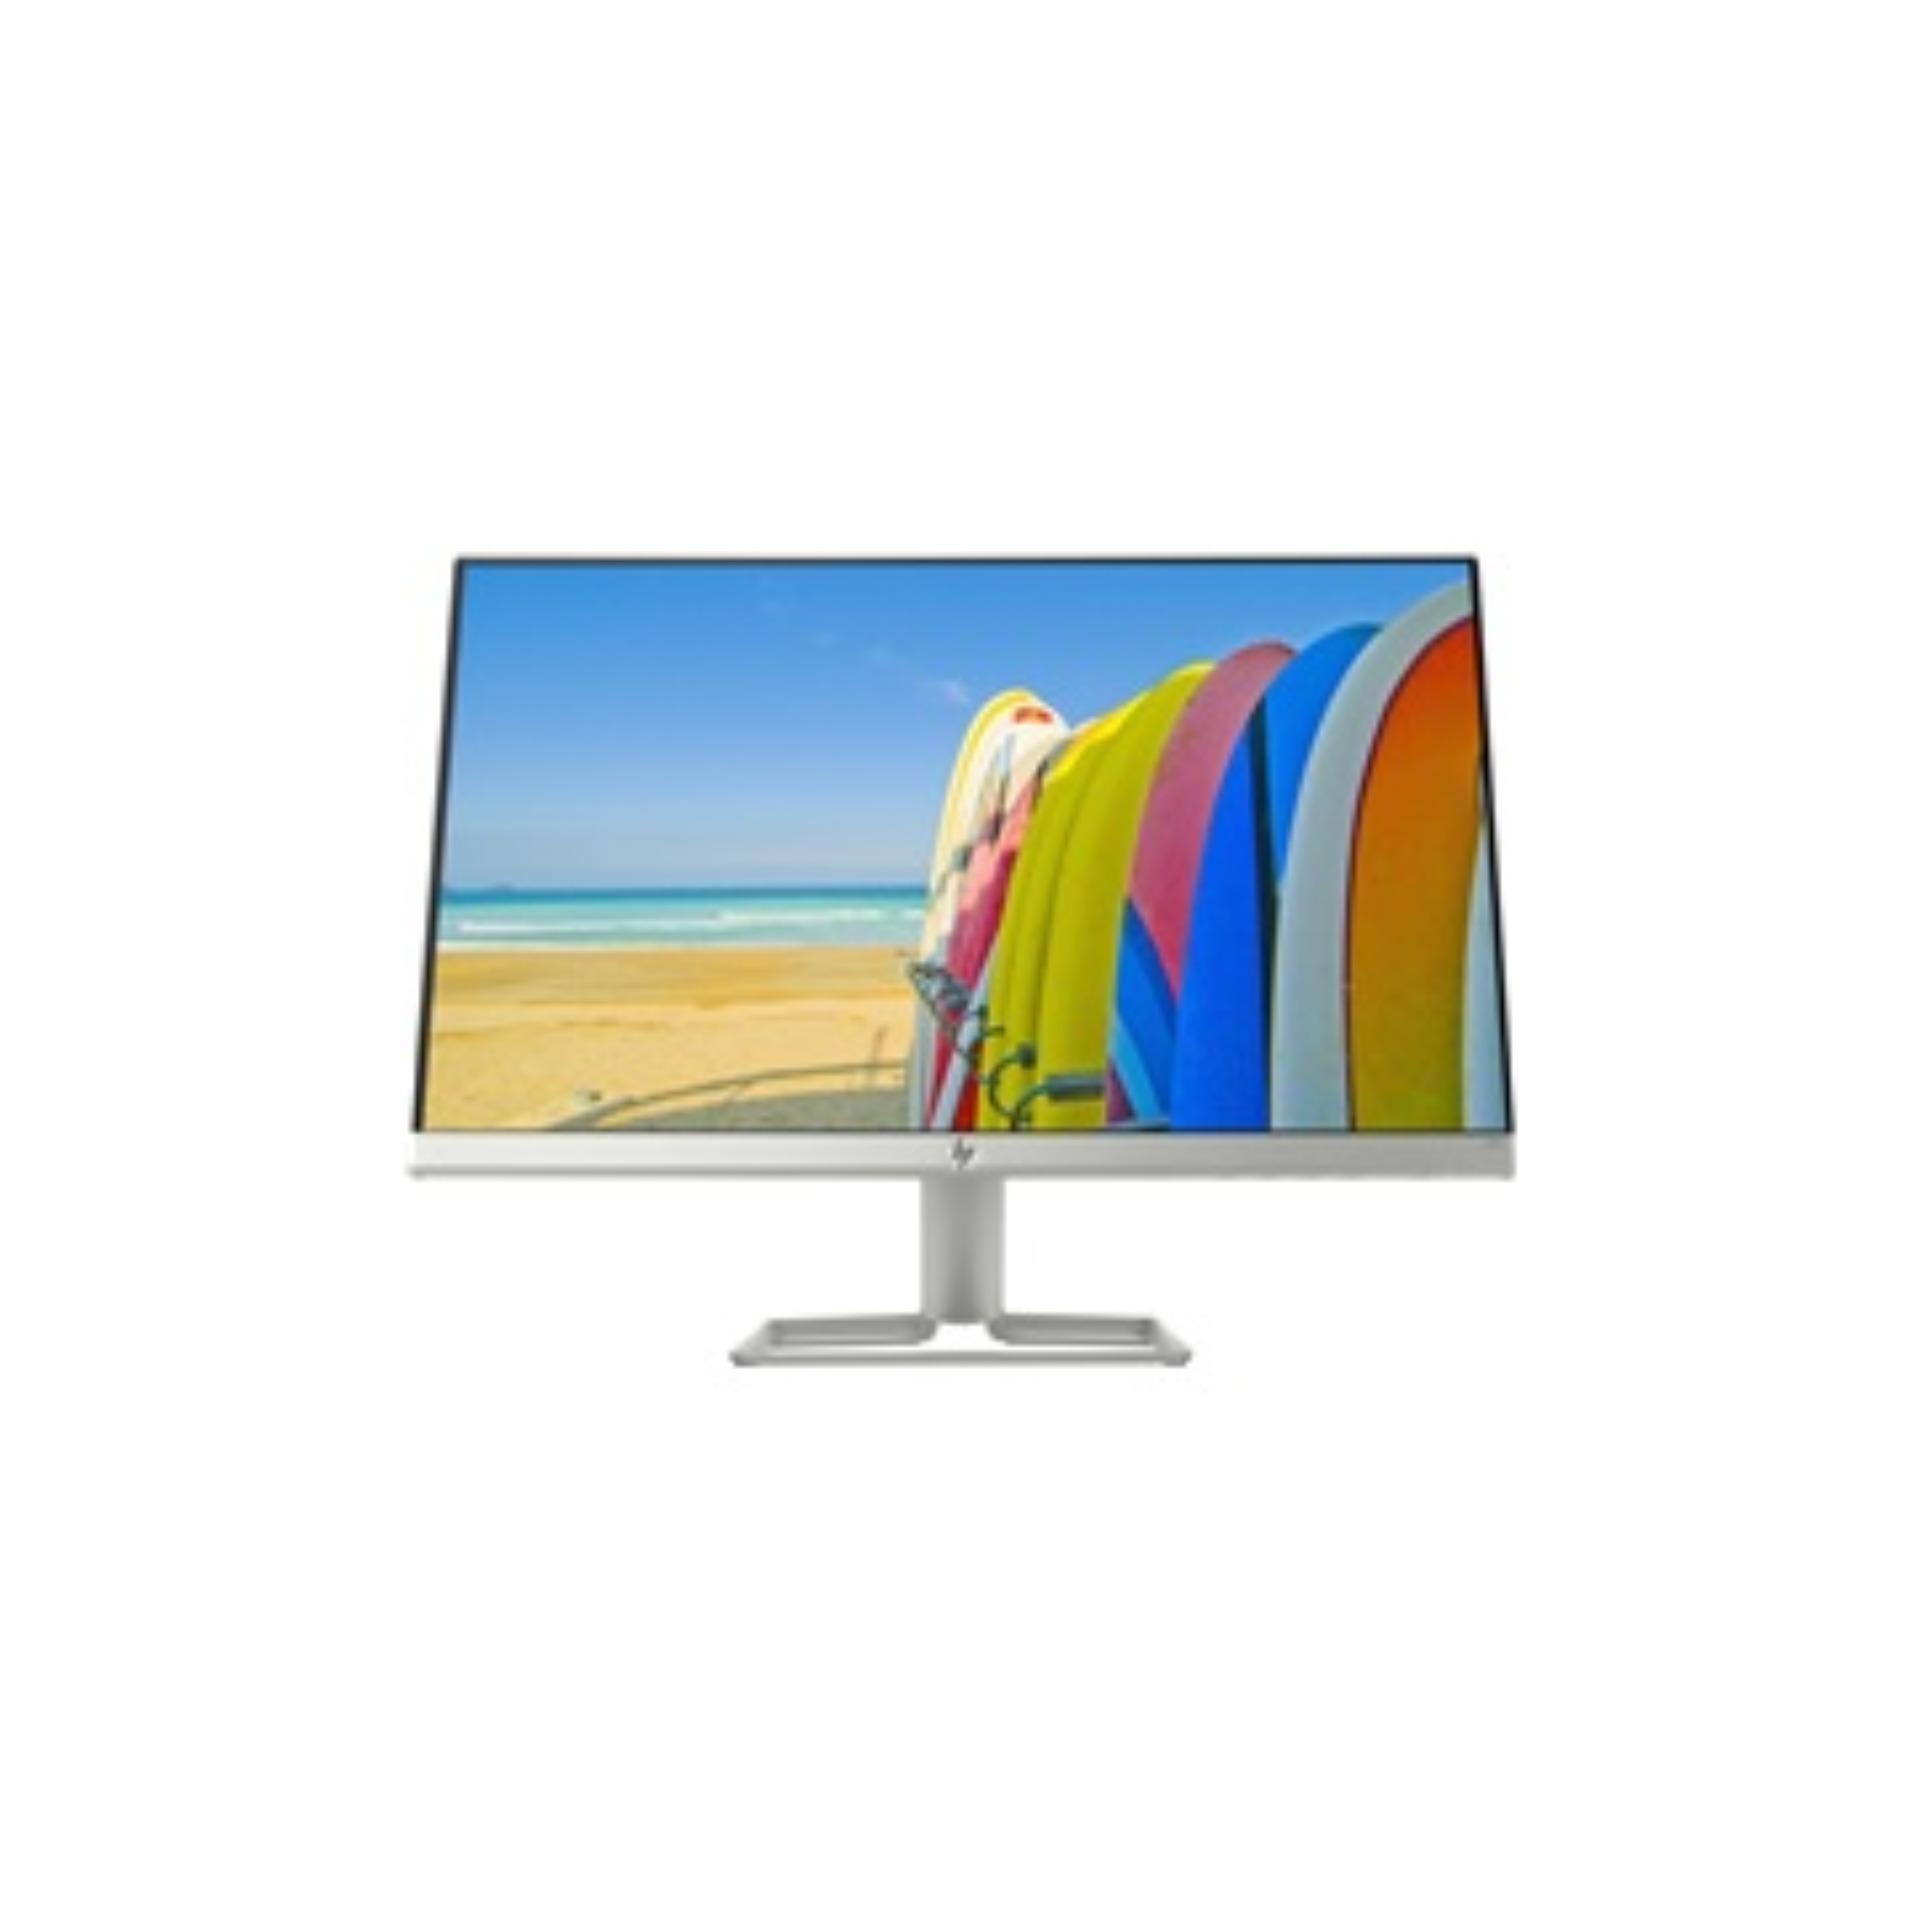 HP 23f 23-inch Display